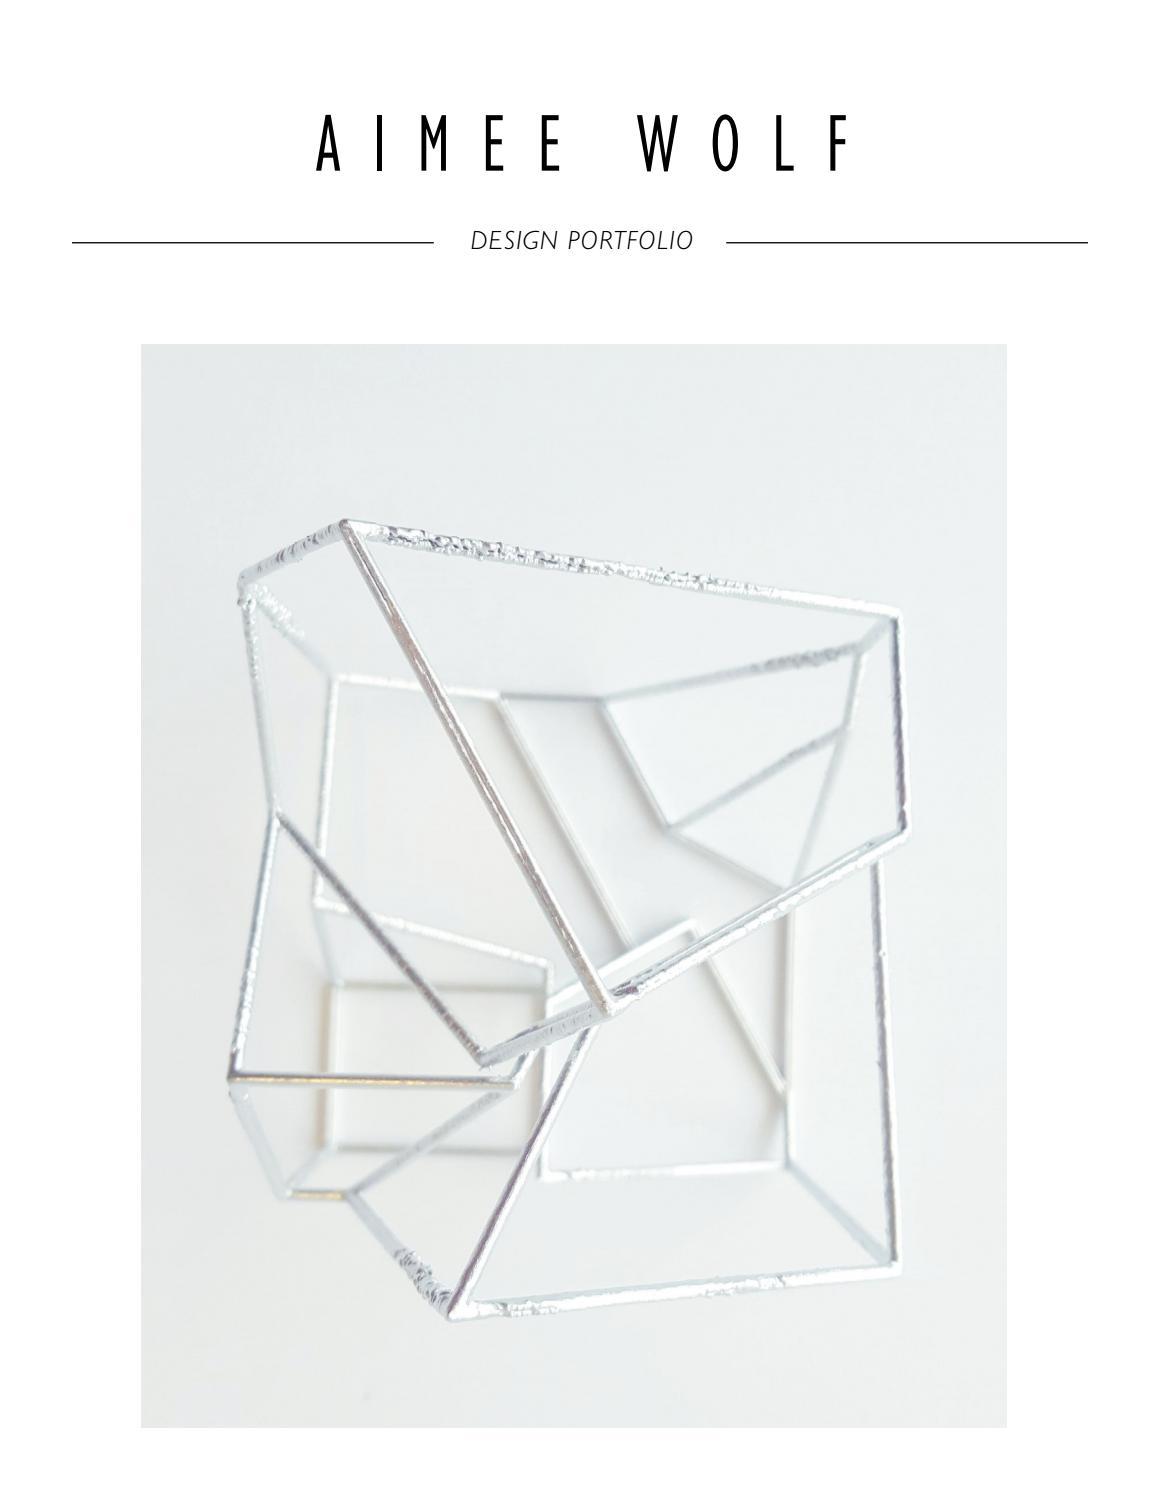 Super Aimee Wolf Design Portfolio By Aimeecwolf Issuu Alphanode Cool Chair Designs And Ideas Alphanodeonline